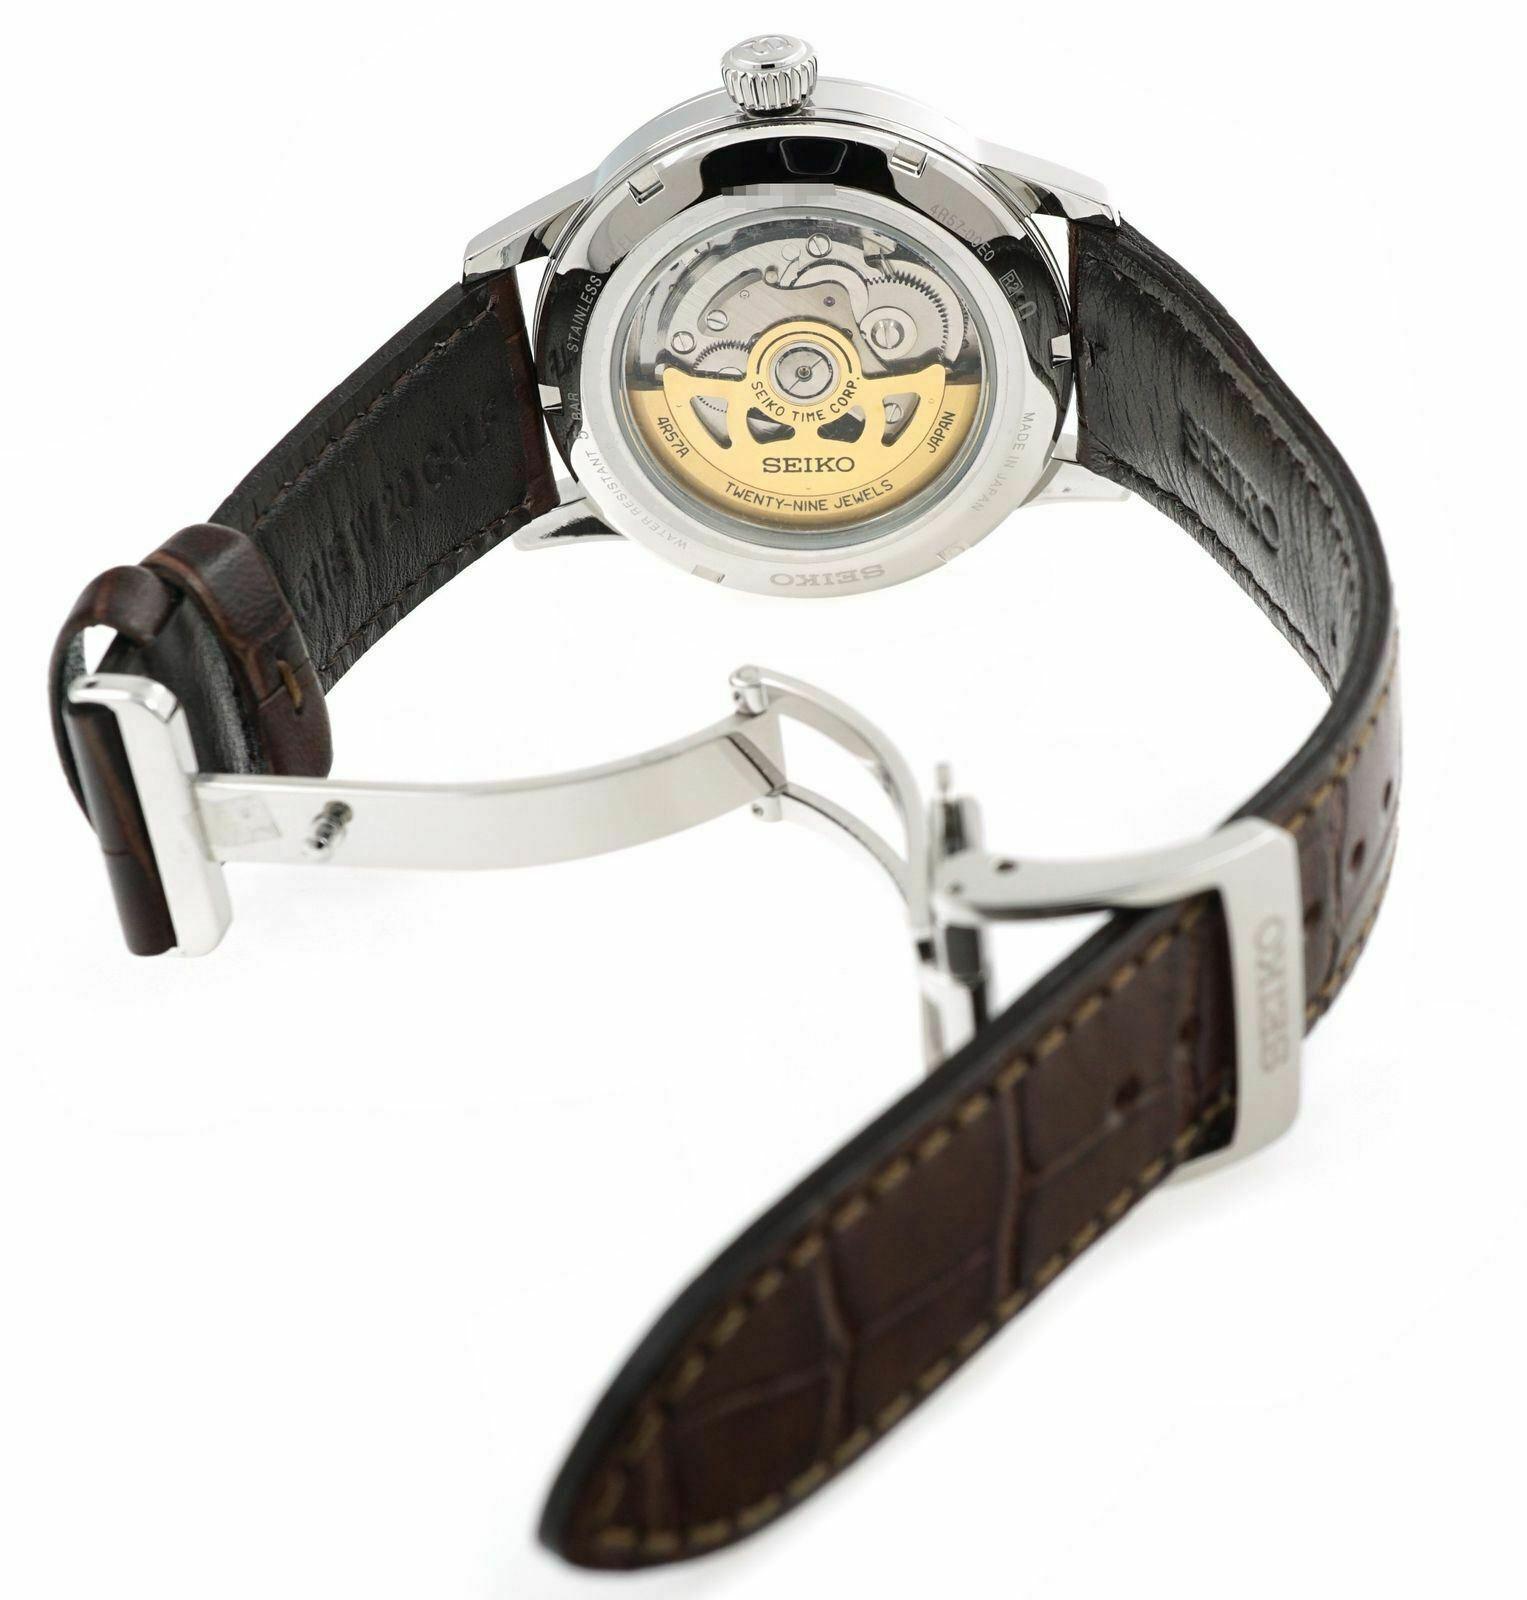 New Seiko Presage Champagne Dial Leather Strap Men's Watch SSA387